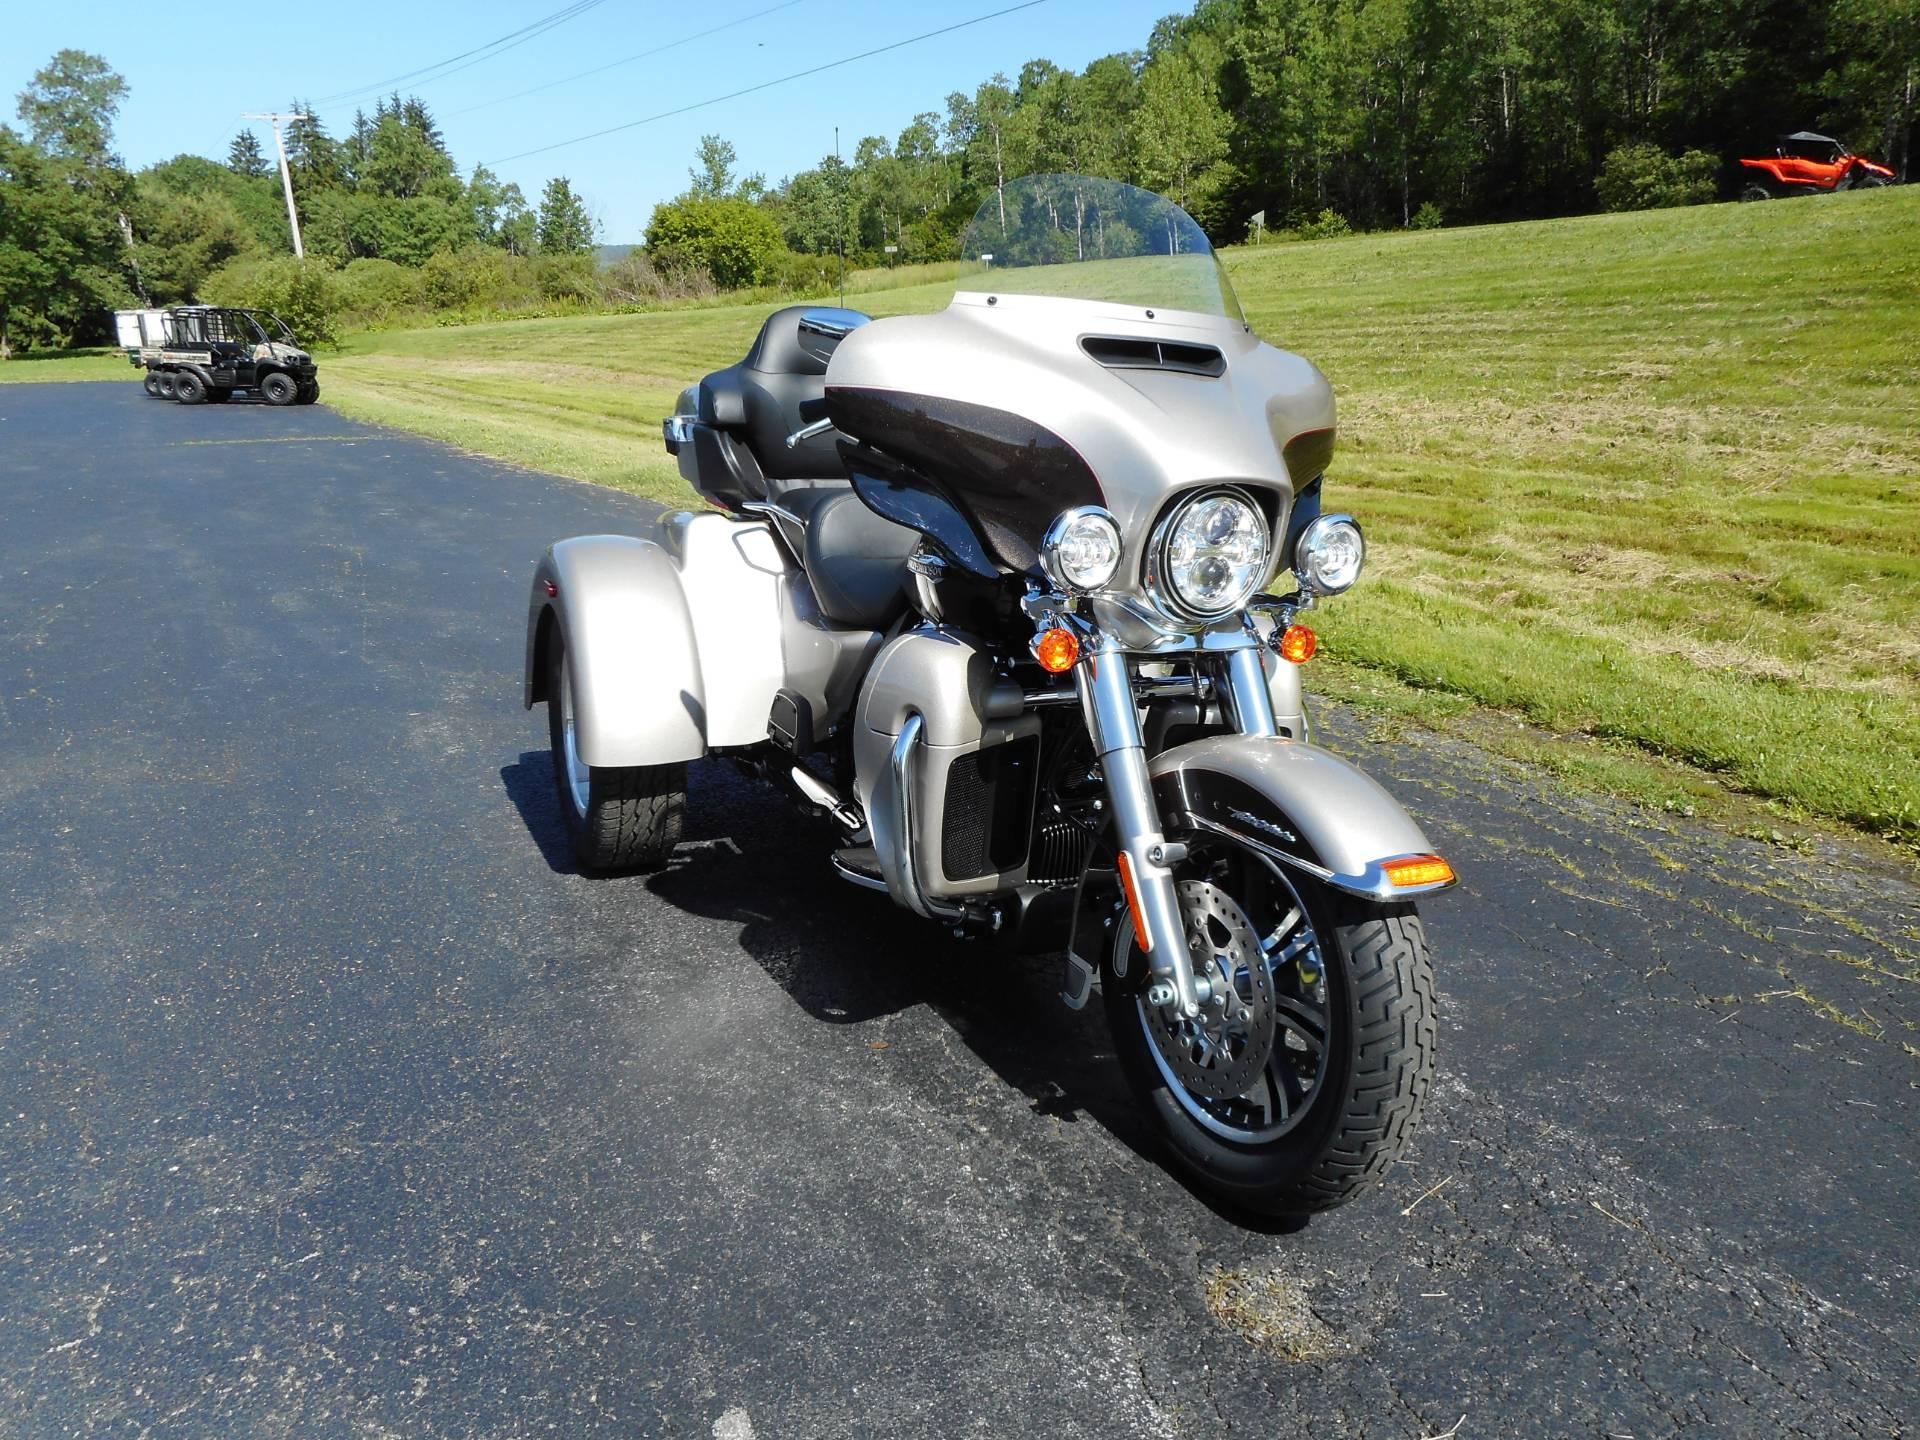 2018 Harley Davidson Tri Glide Ultra Review: New 2018 Harley-Davidson Tri Glide® Ultra Trikes In